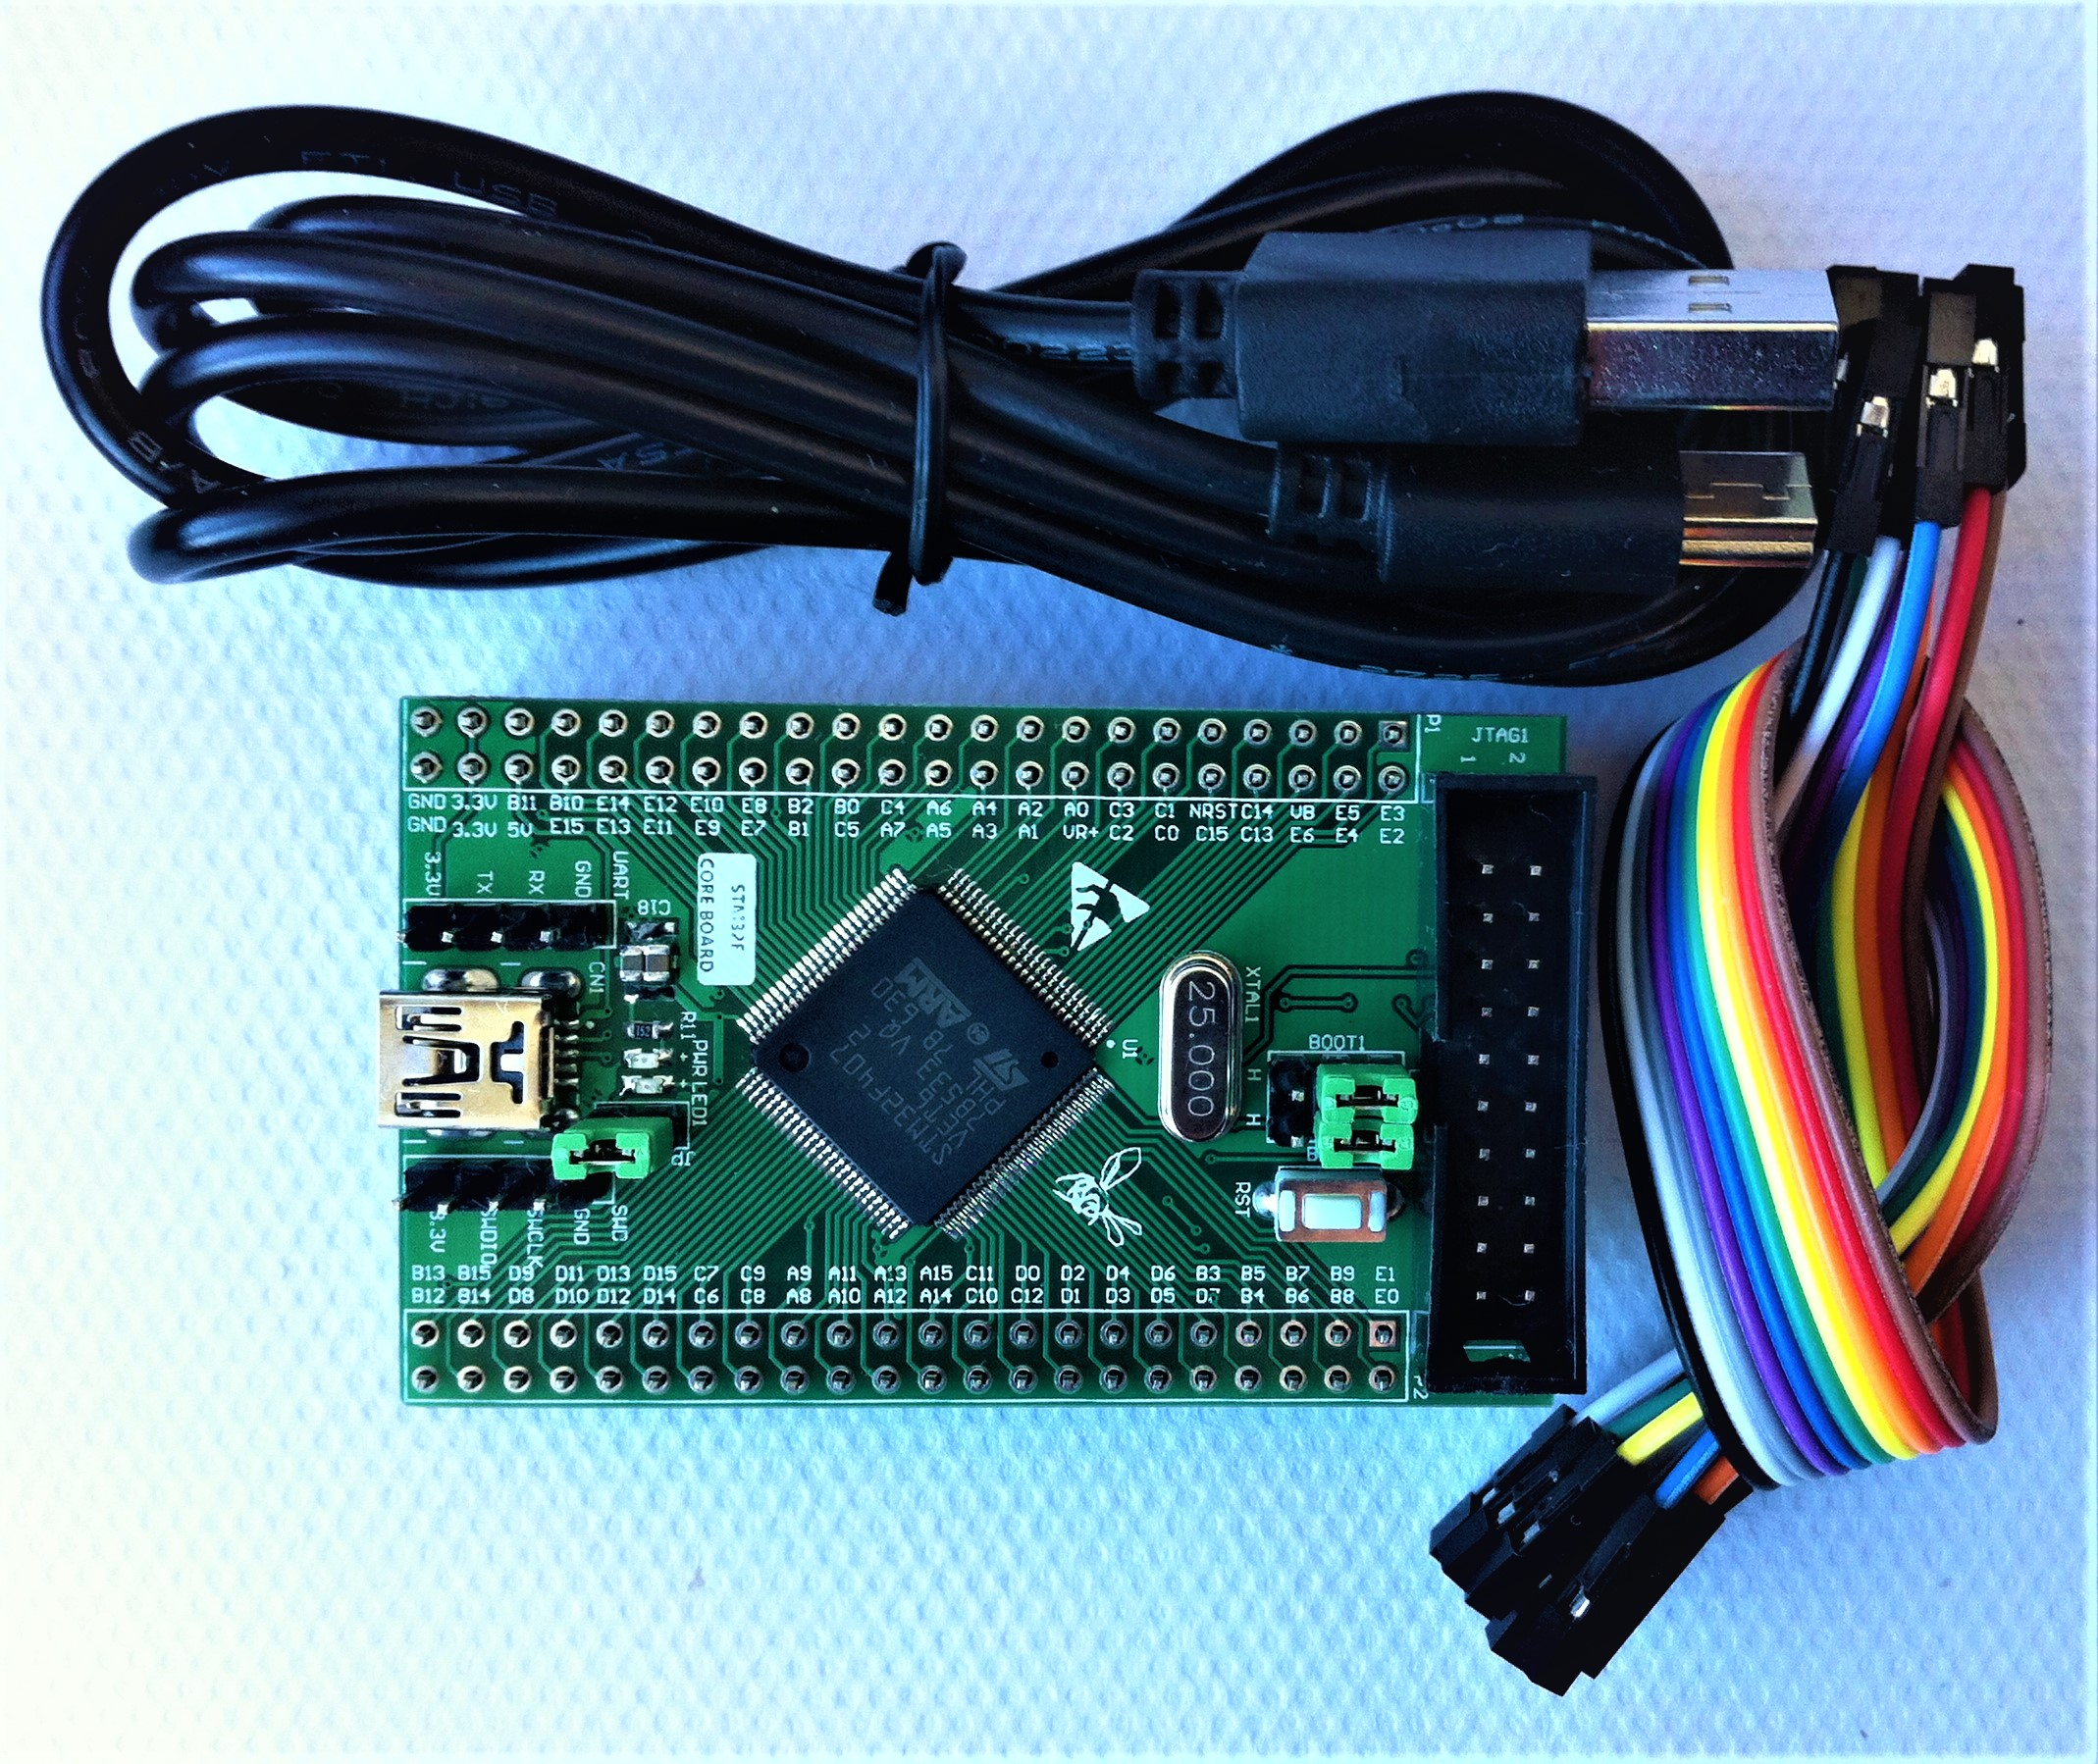 цена на STM32F407VET6 Core Board Minimum System Development Board STM32F407 VET6 Mini Board